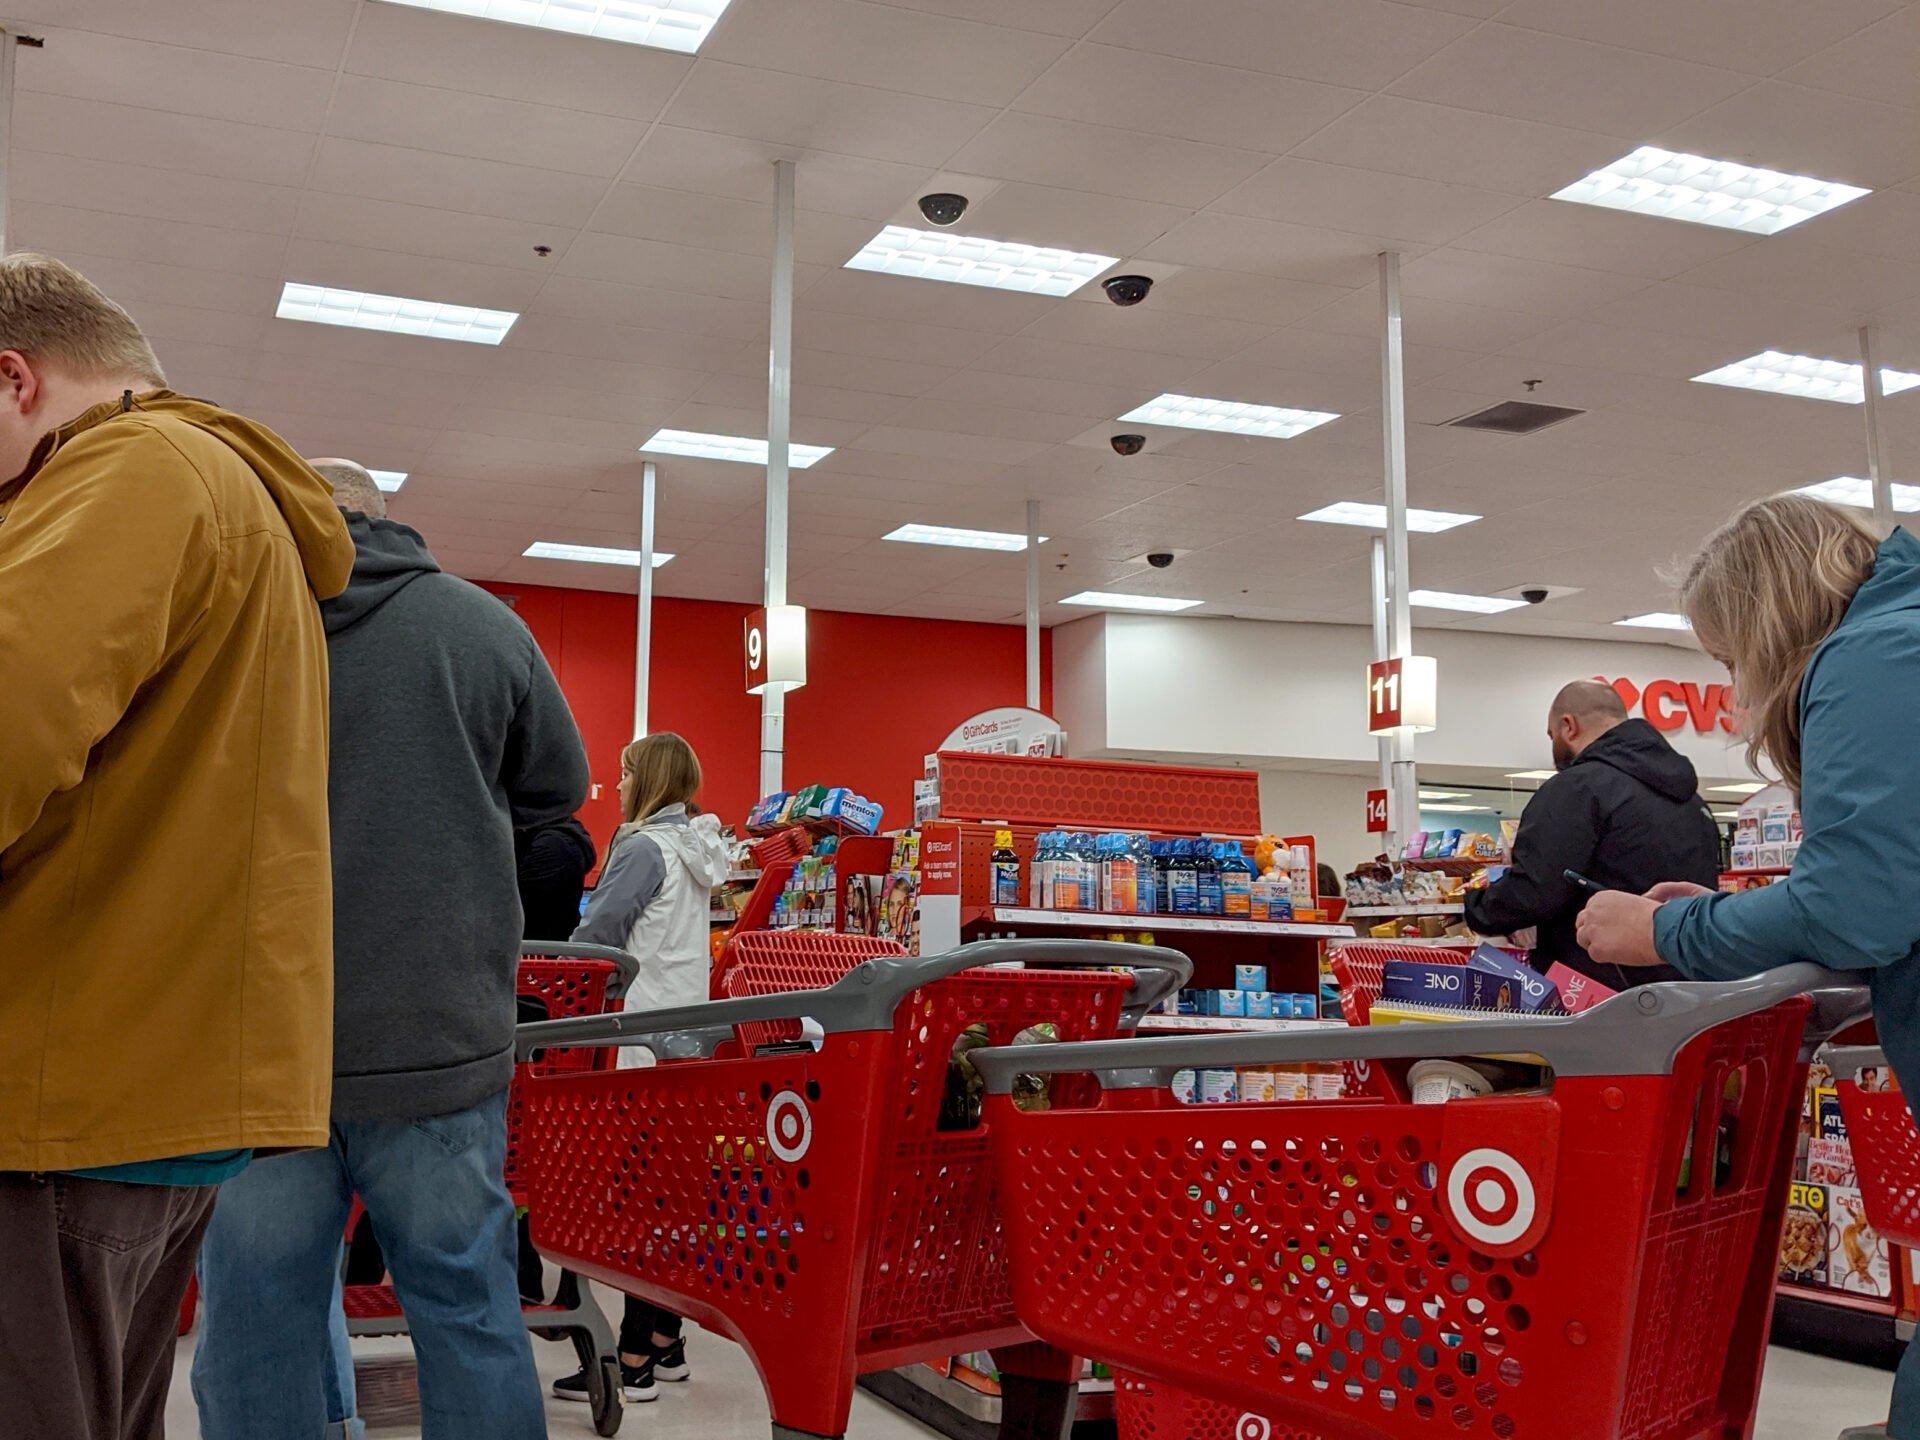 People waiting in line in Target